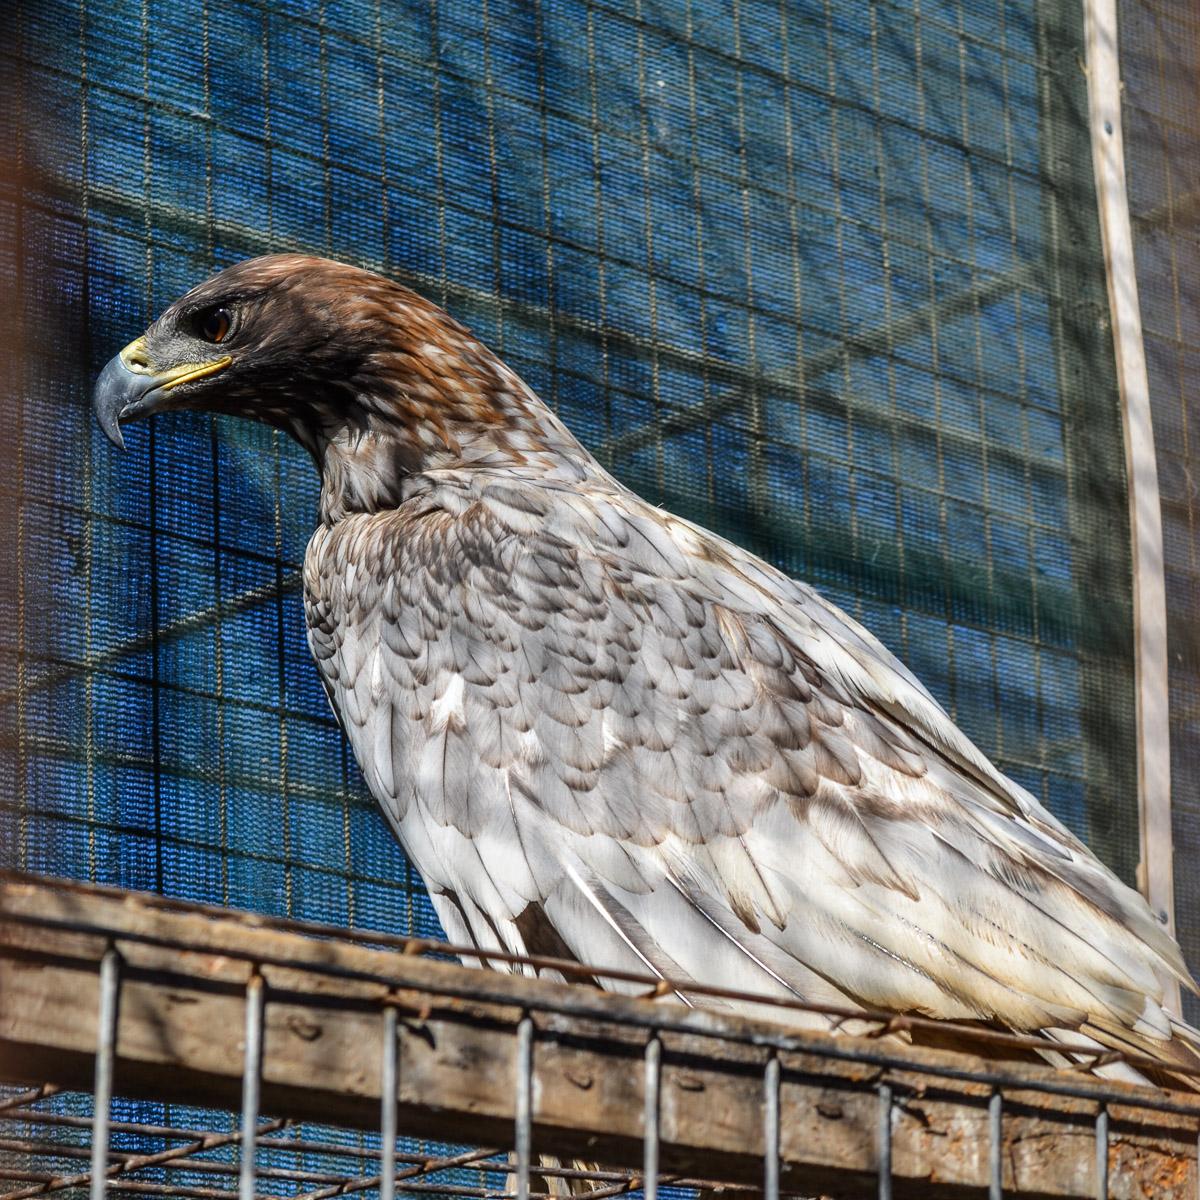 Golden Eagle. Photo by Nadja Sayej